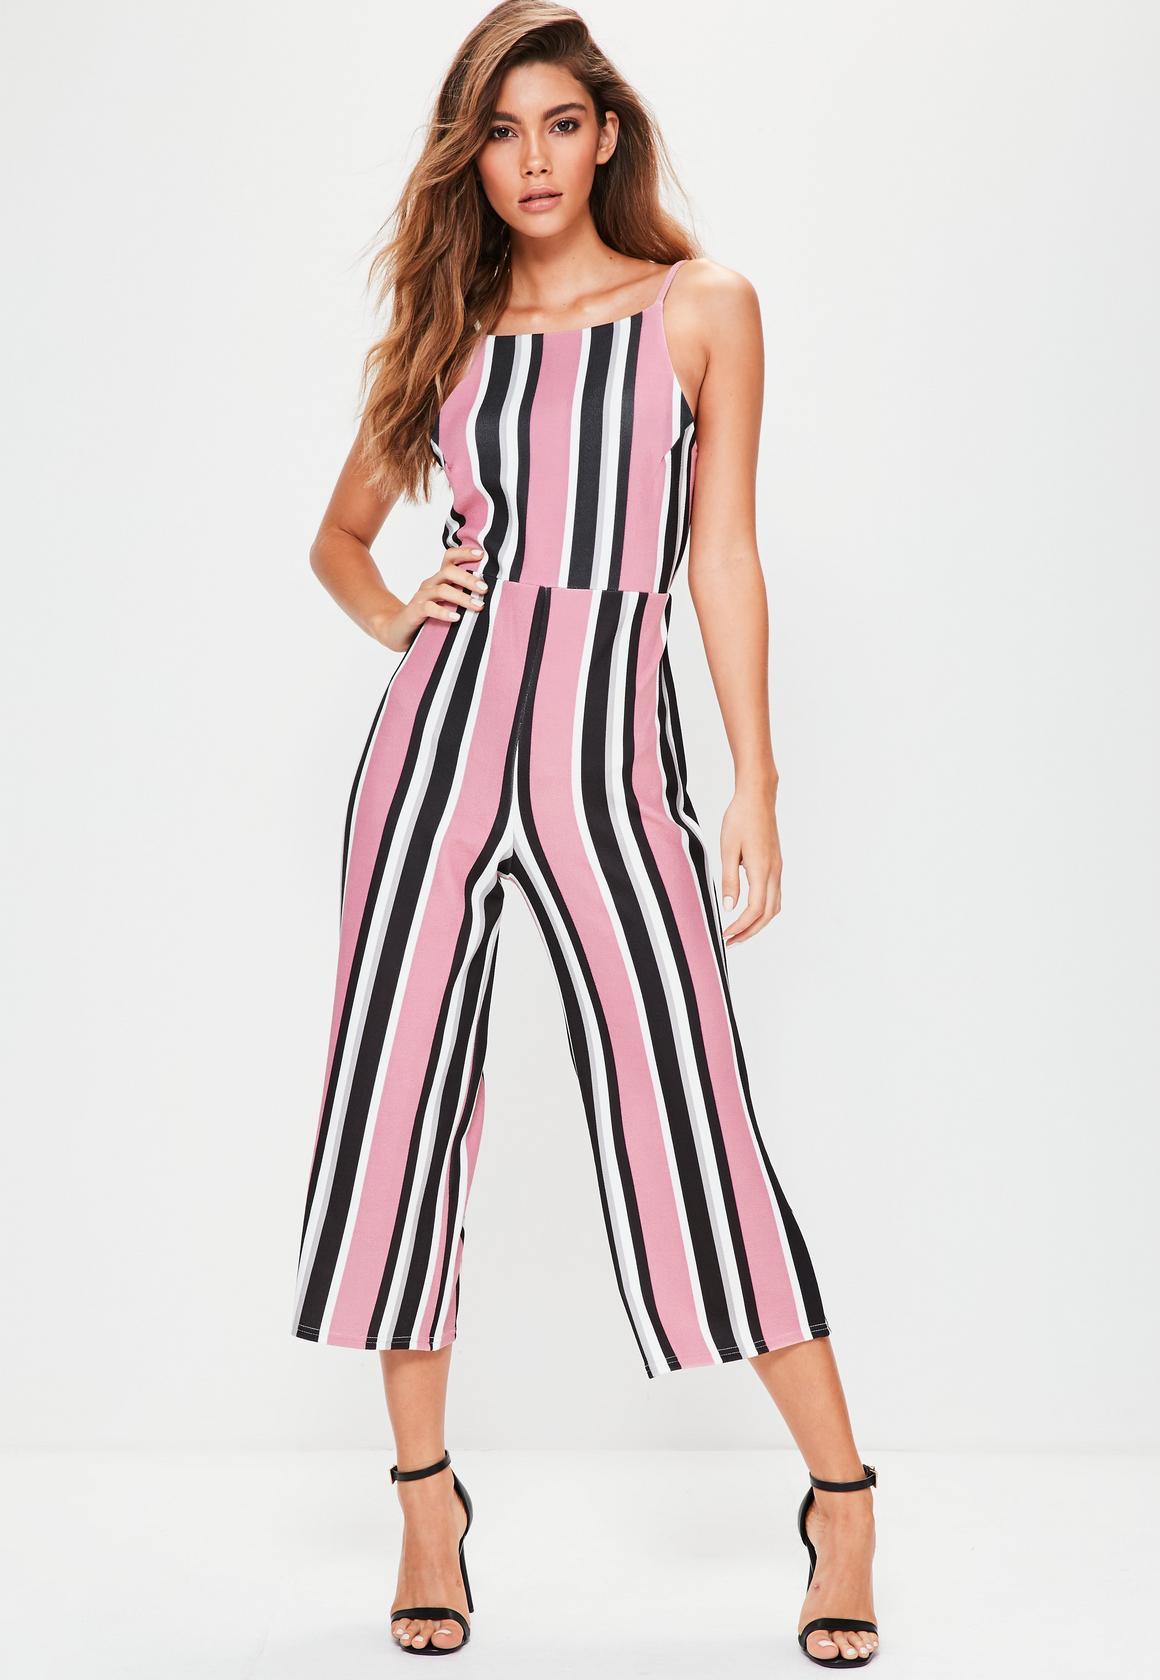 pink-light-jumpsuit-vertical-stripe-print-black-shoe-sandalh-howtowear-spring-summer-hairr-lunch.jpg